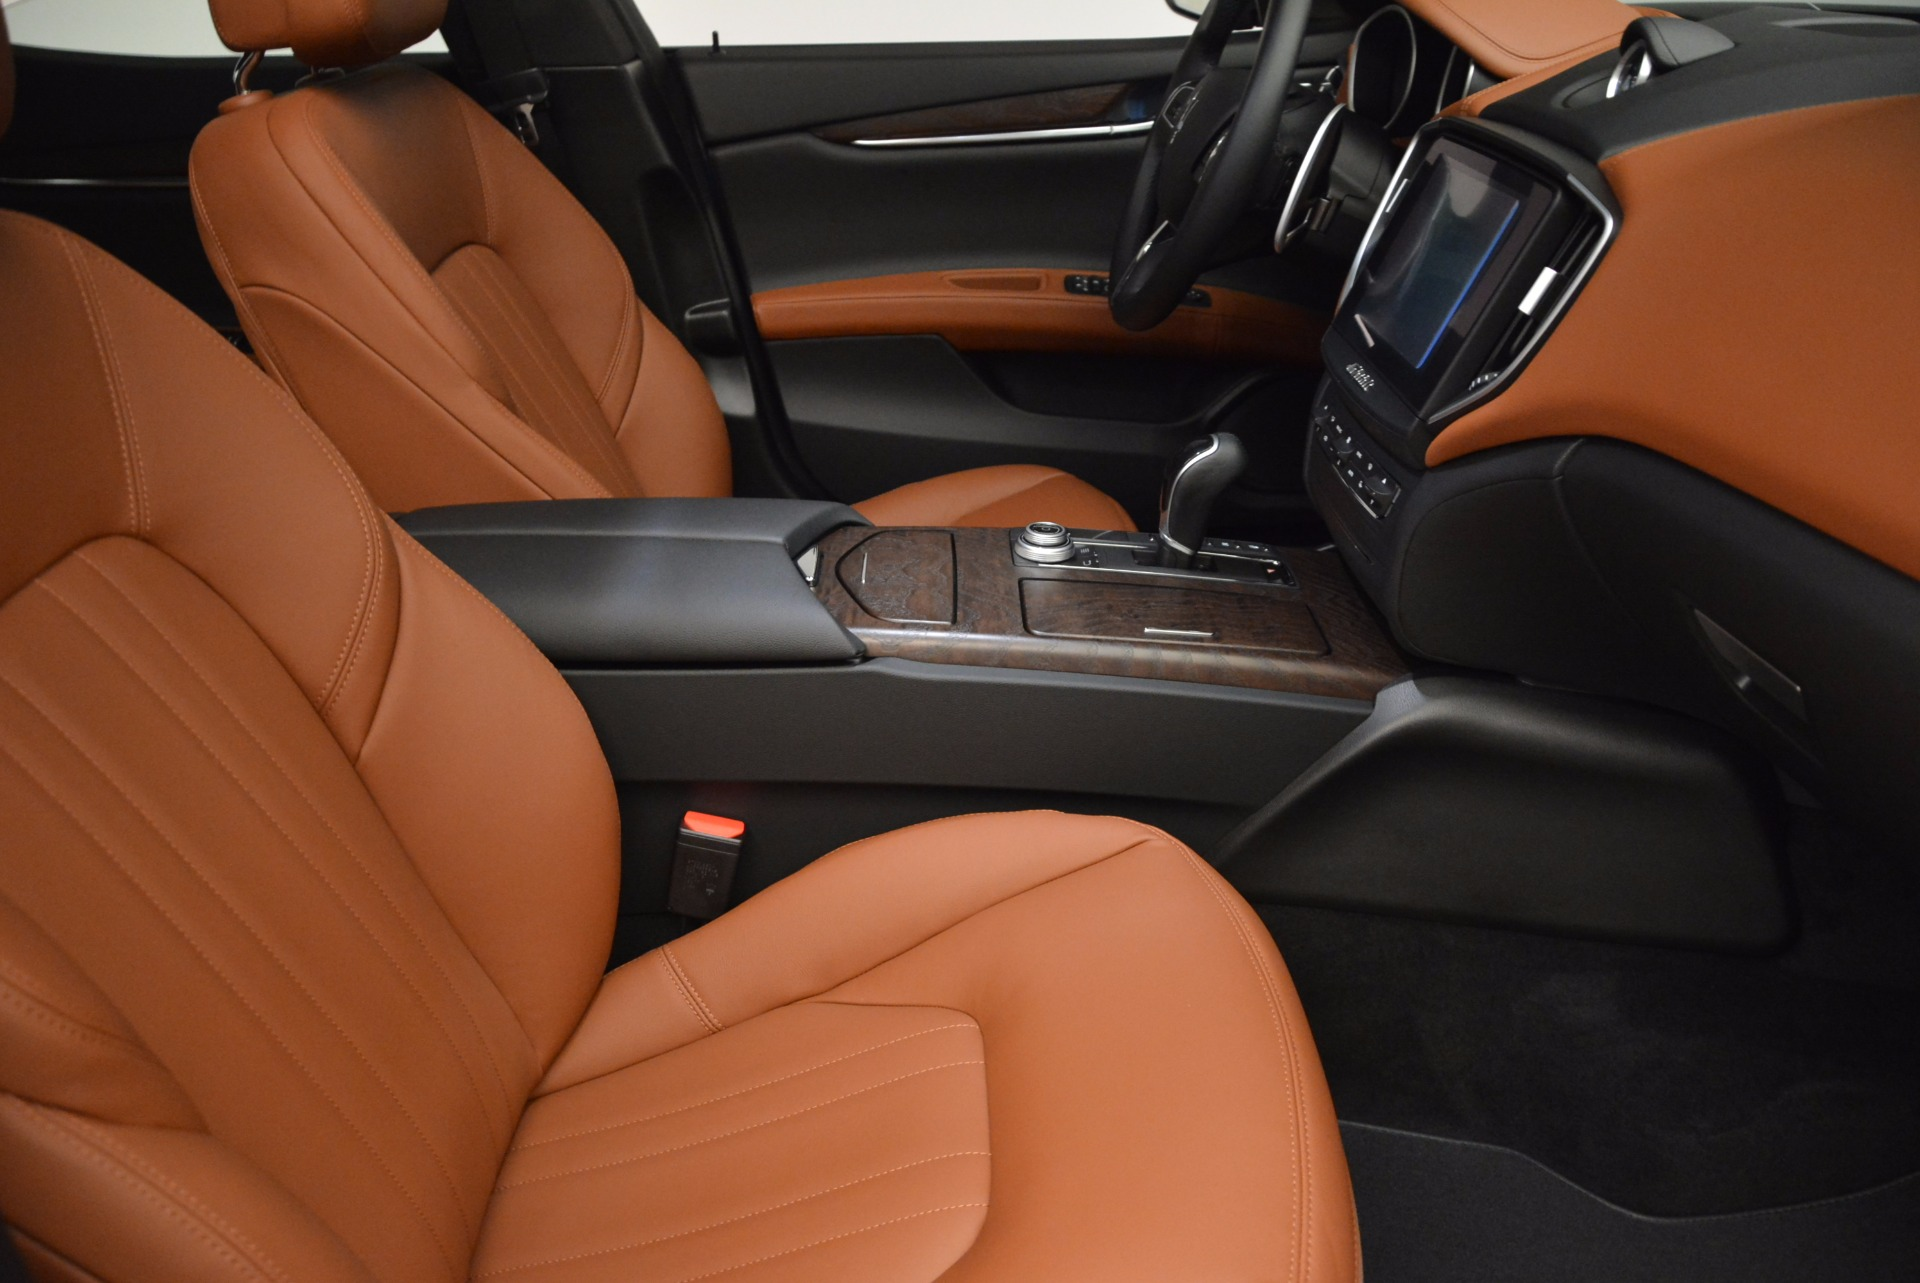 Used 2017 Maserati Ghibli S Q4 Ex-Loaner For Sale In Greenwich, CT 1166_p15